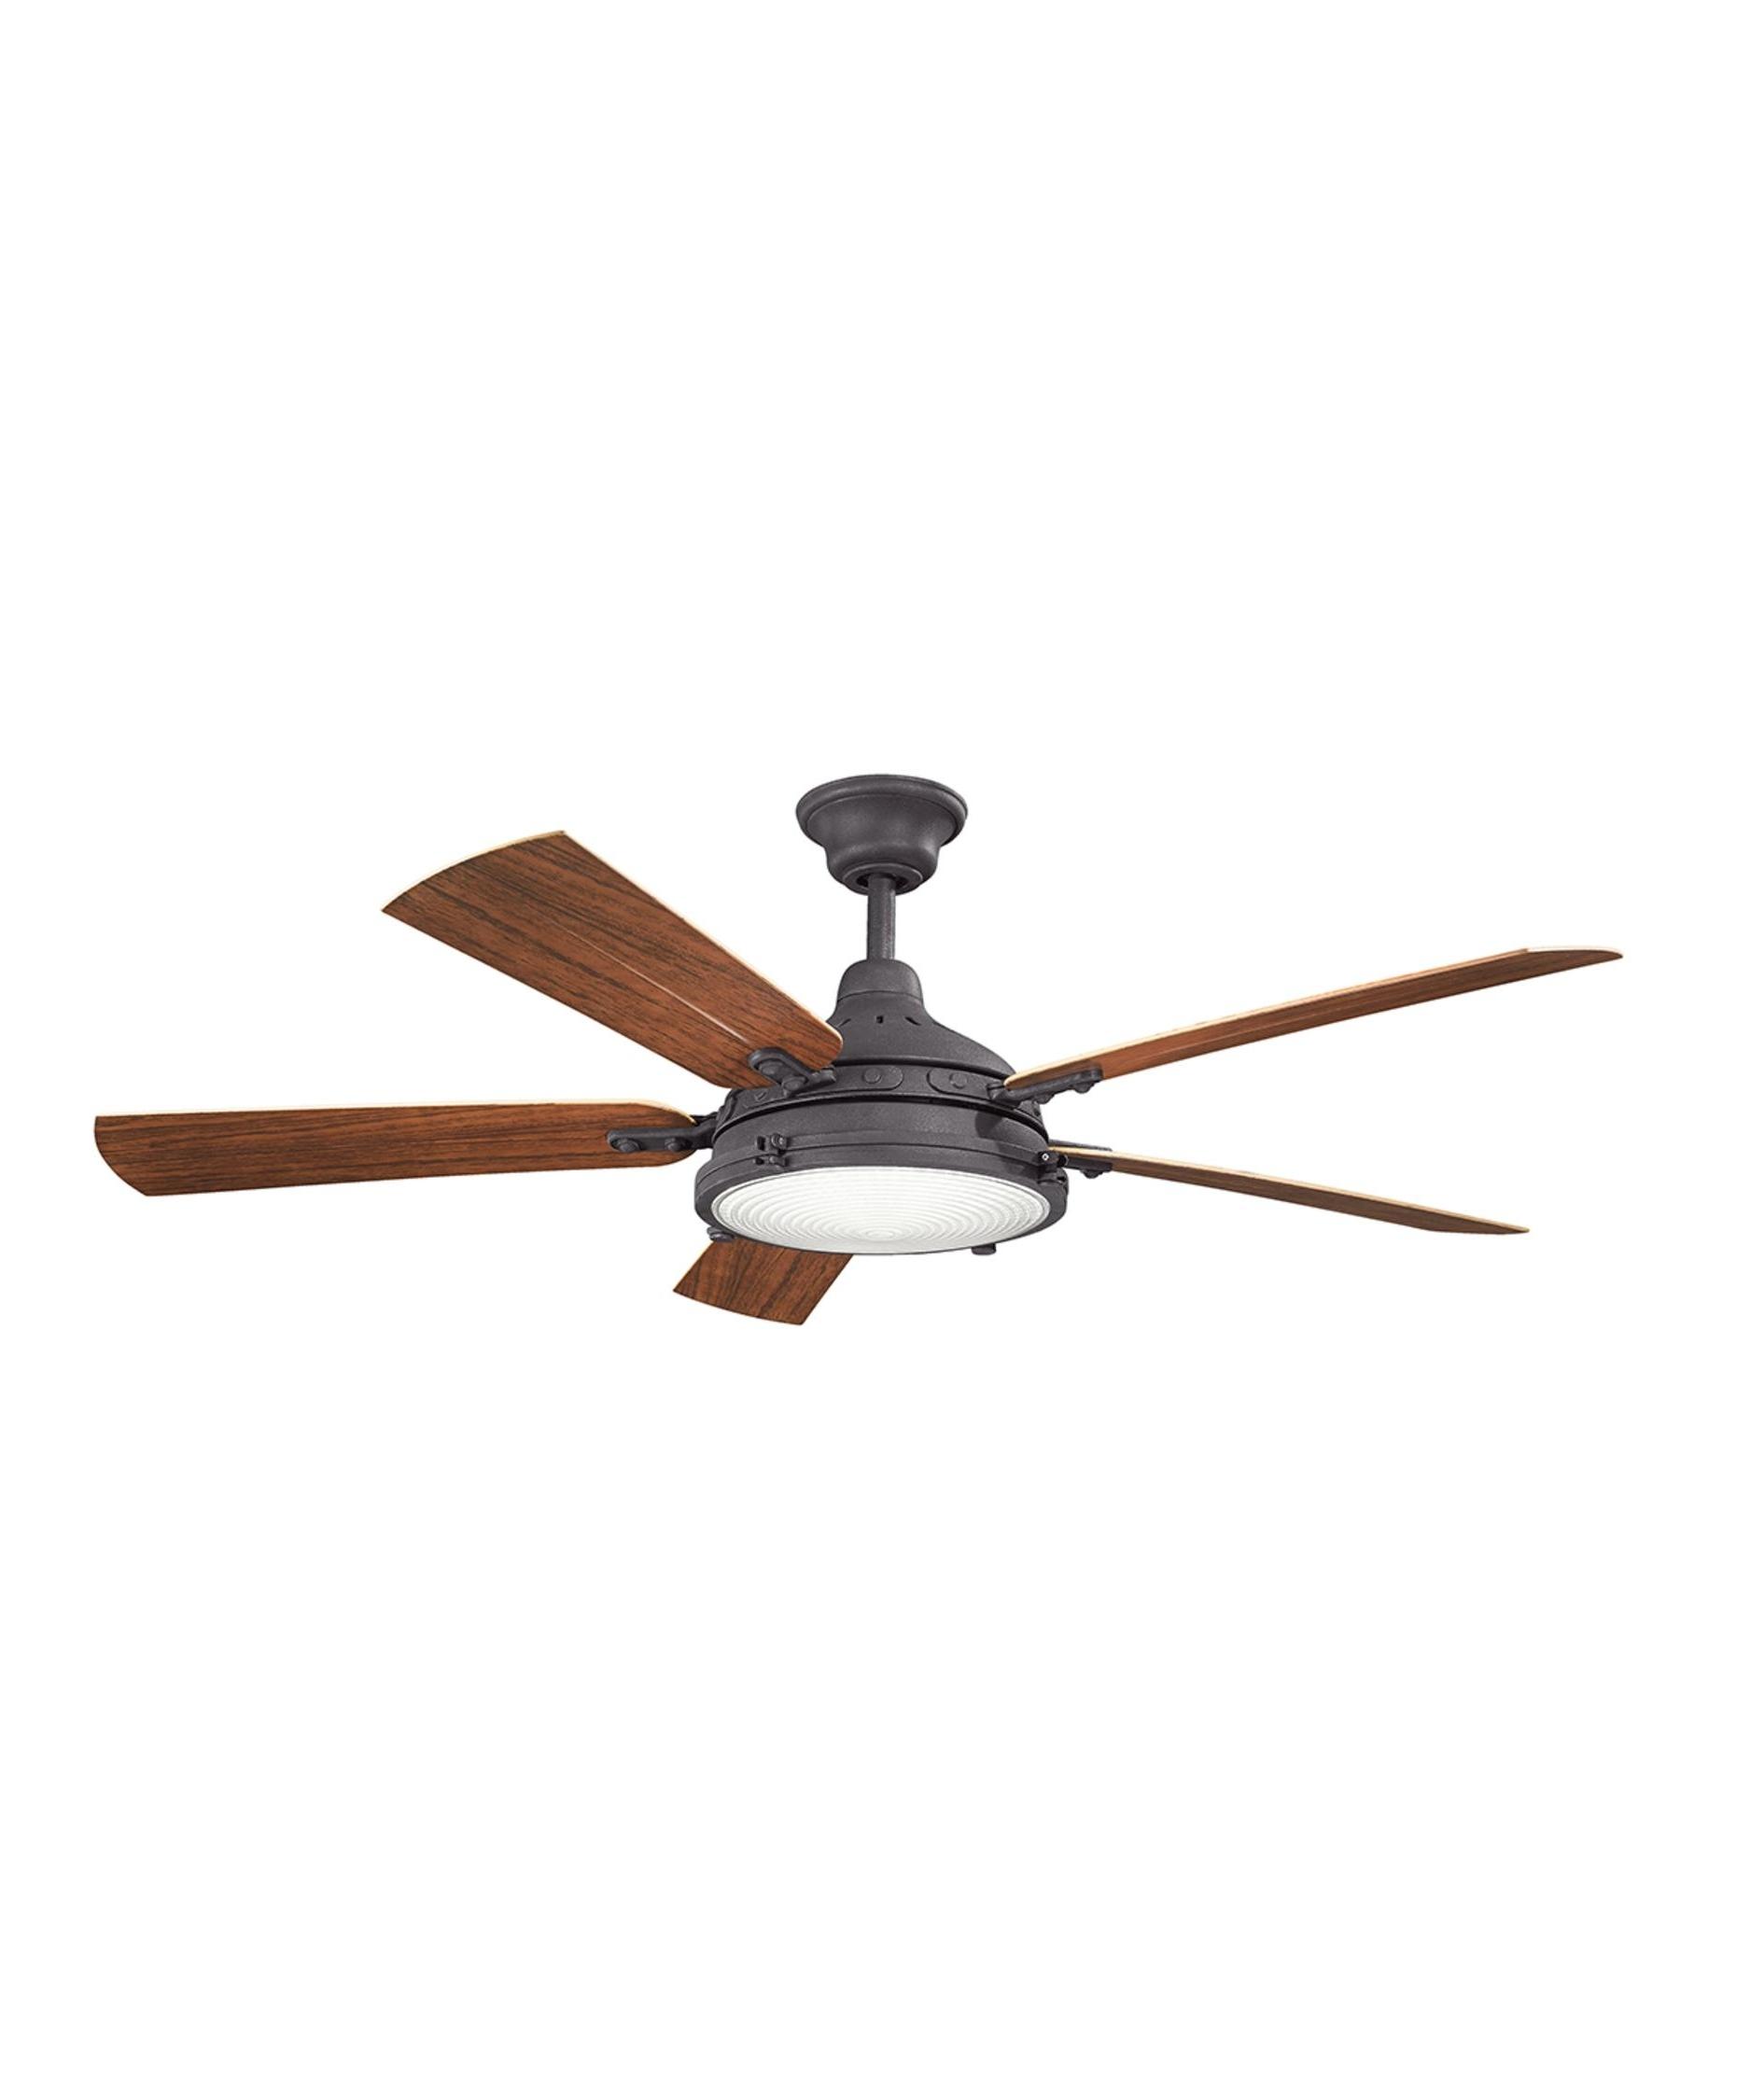 Kichler 310117 Hatteras Bay 60 Inch 5 Blade Ceiling Fan (View 8 of 20)